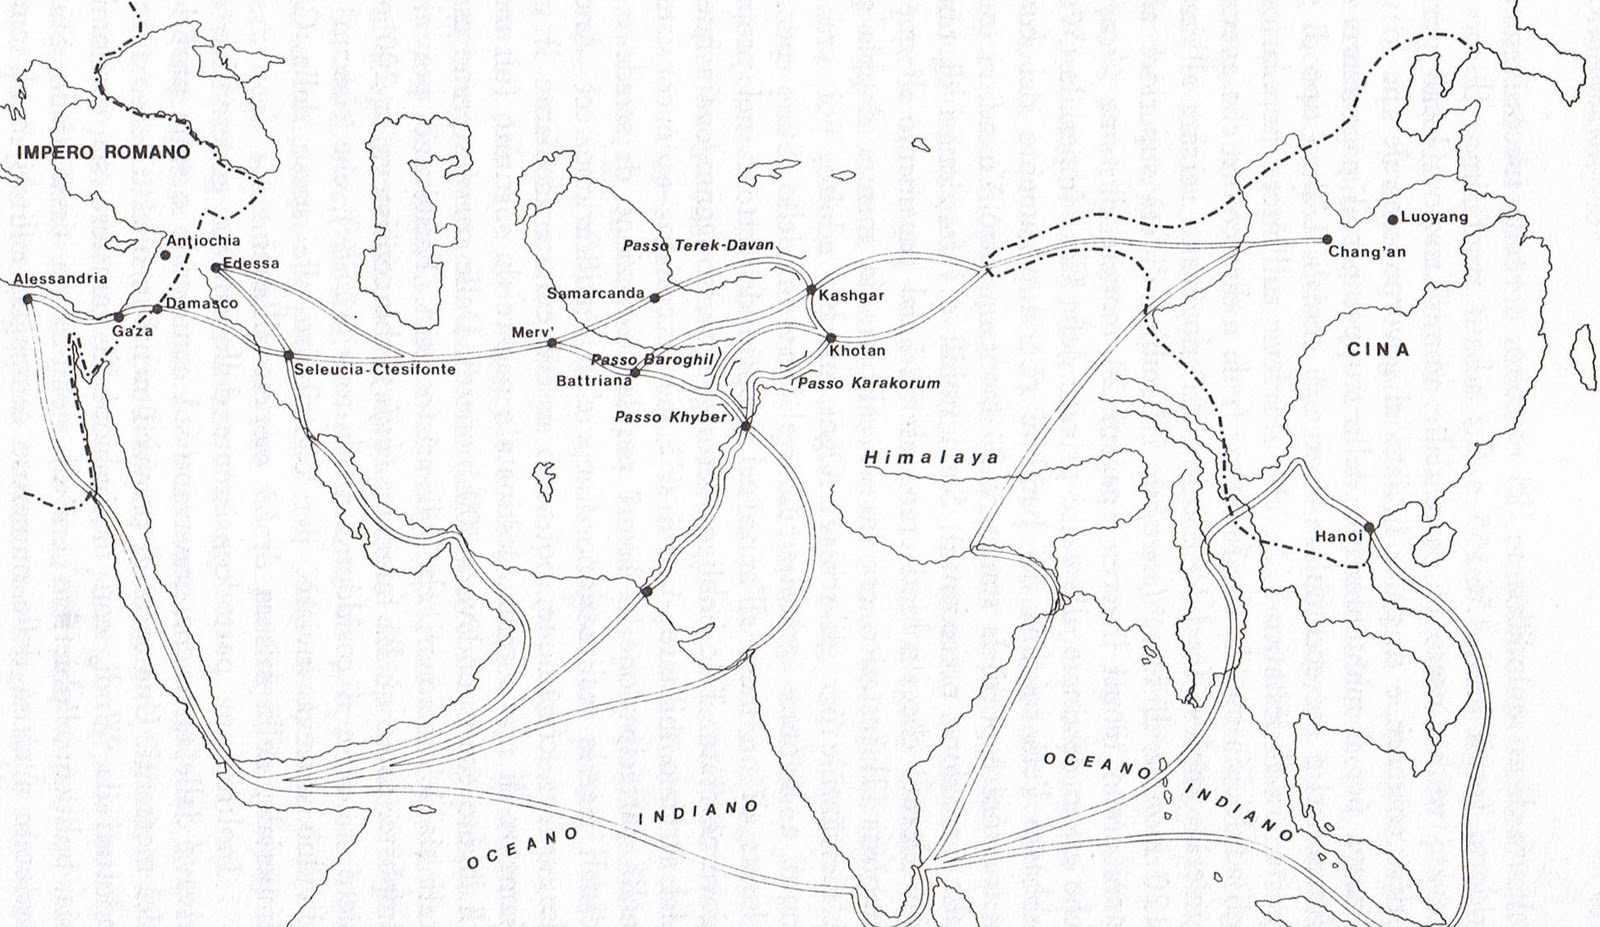 10 via della seta2 - Grande route de la soie